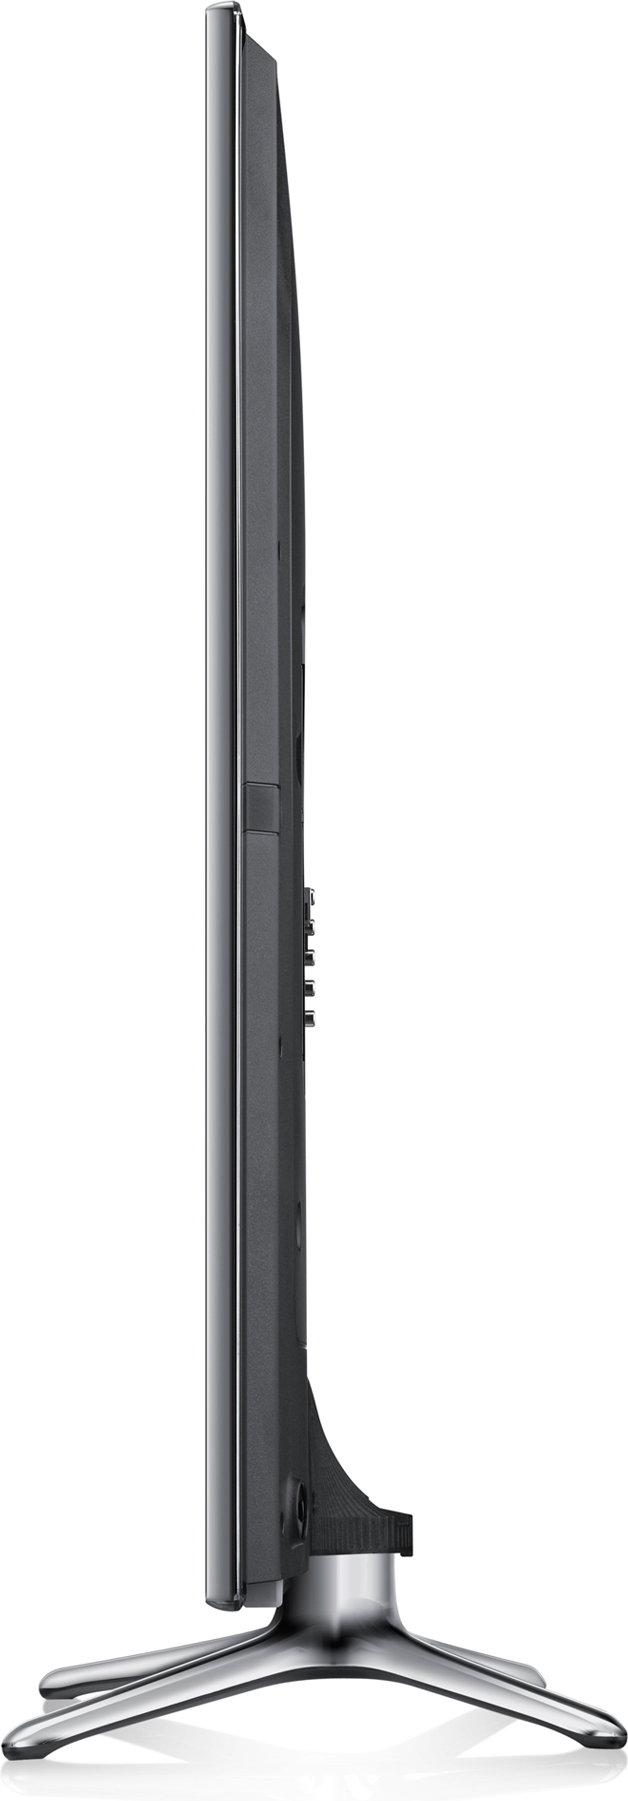 Samsung UE50F6500